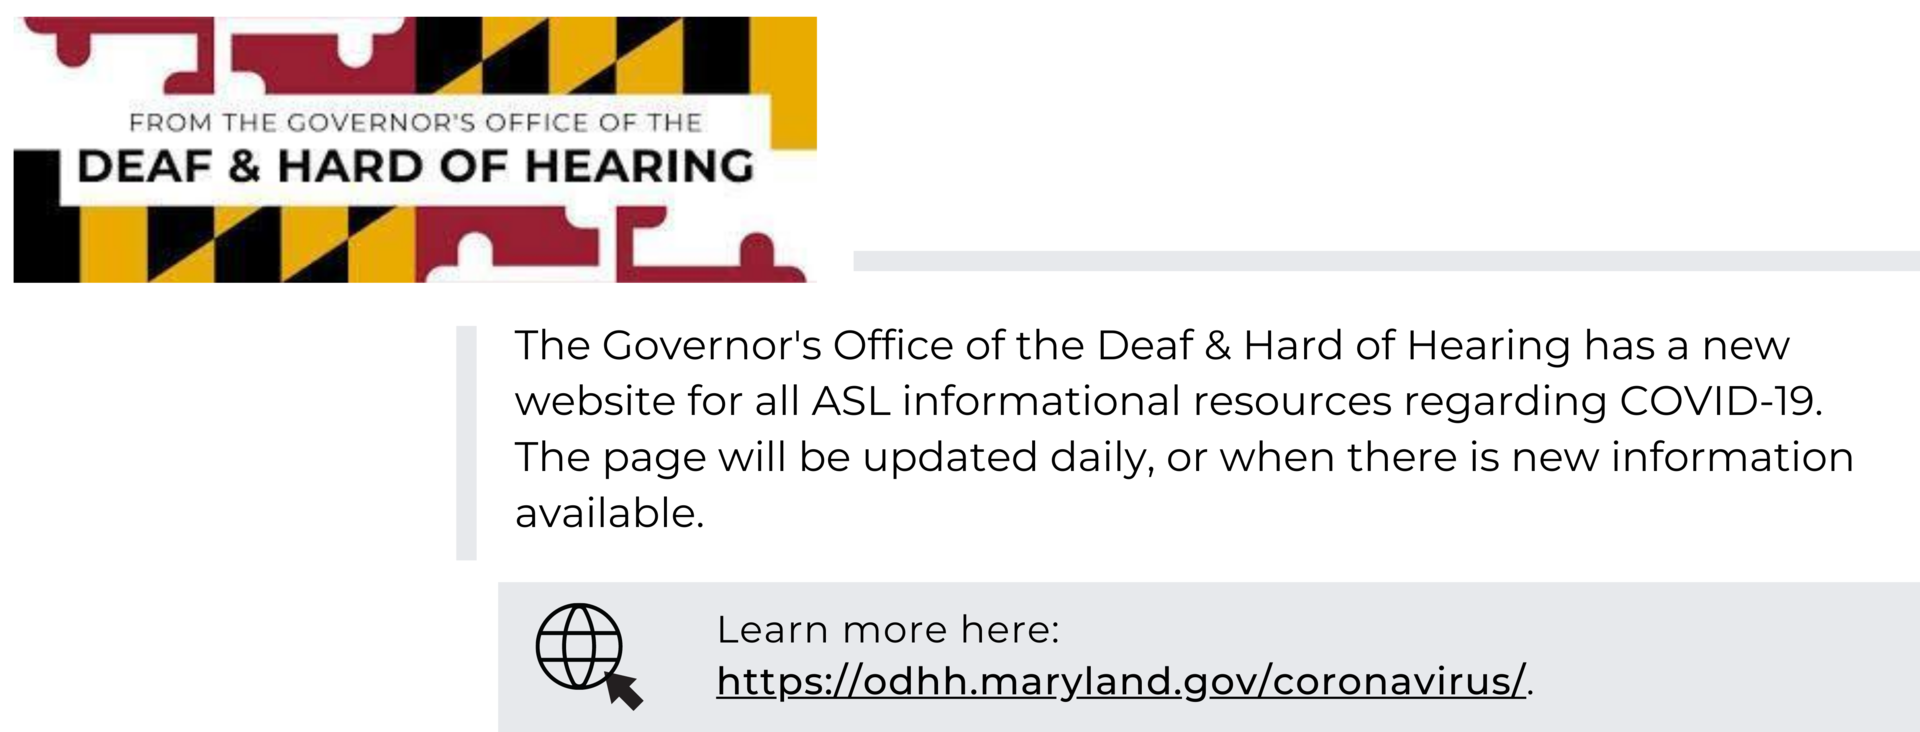 Maryland ODHH